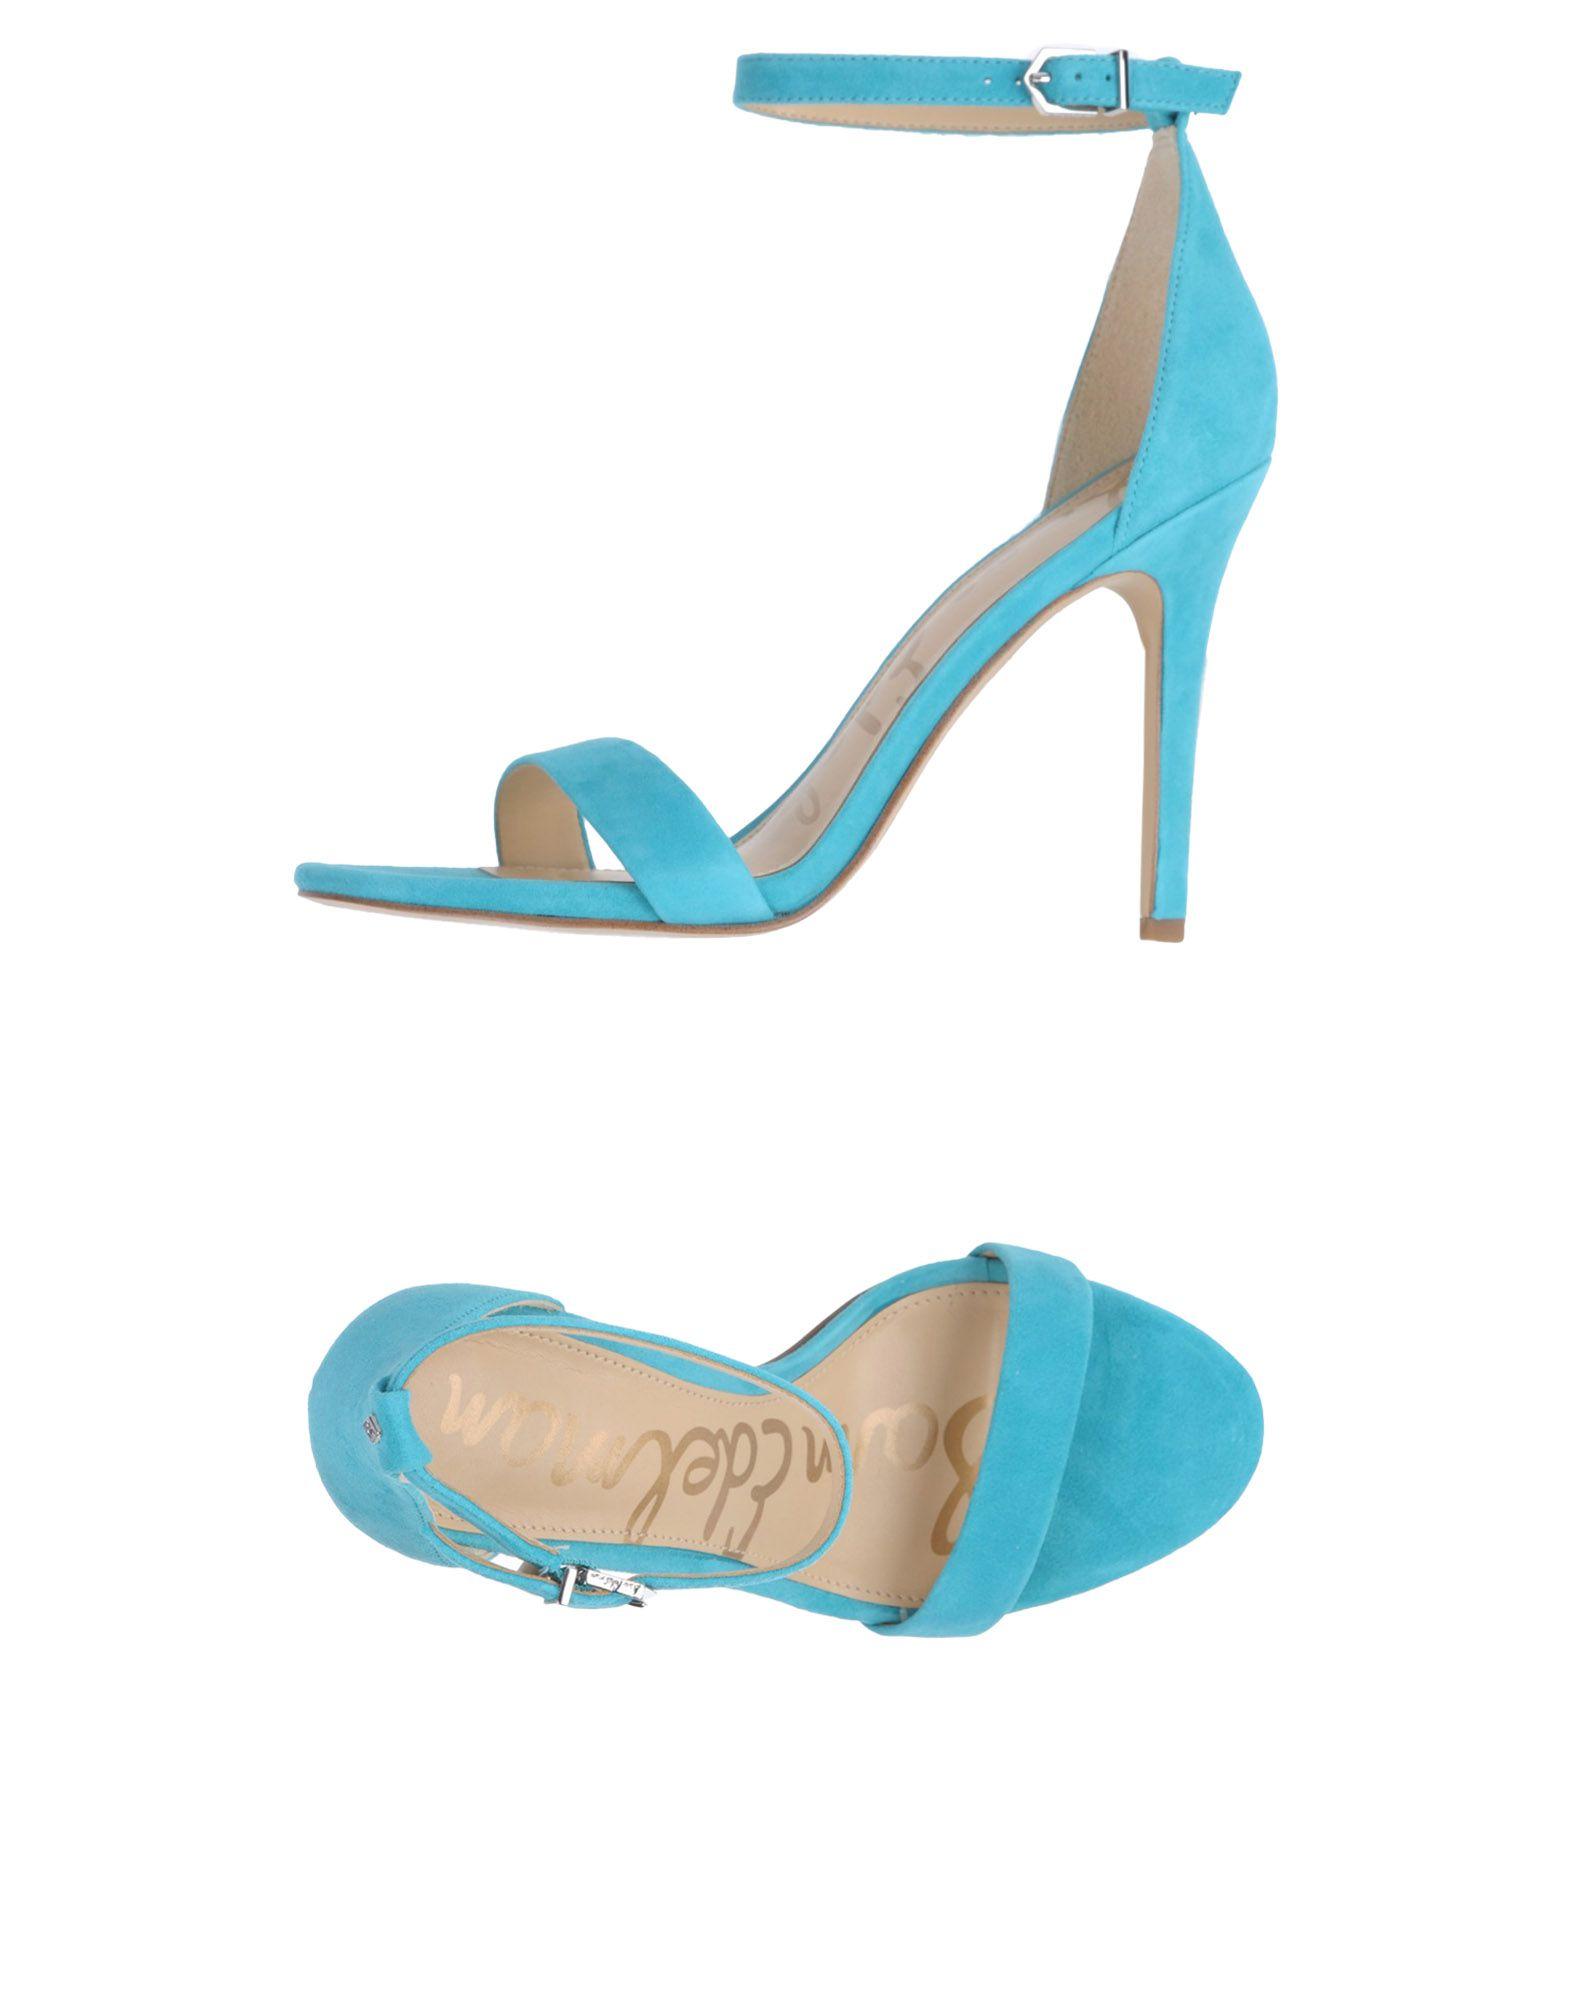 Sam Edelman Sandalen Damen  11340080XN Gute Qualität beliebte Schuhe